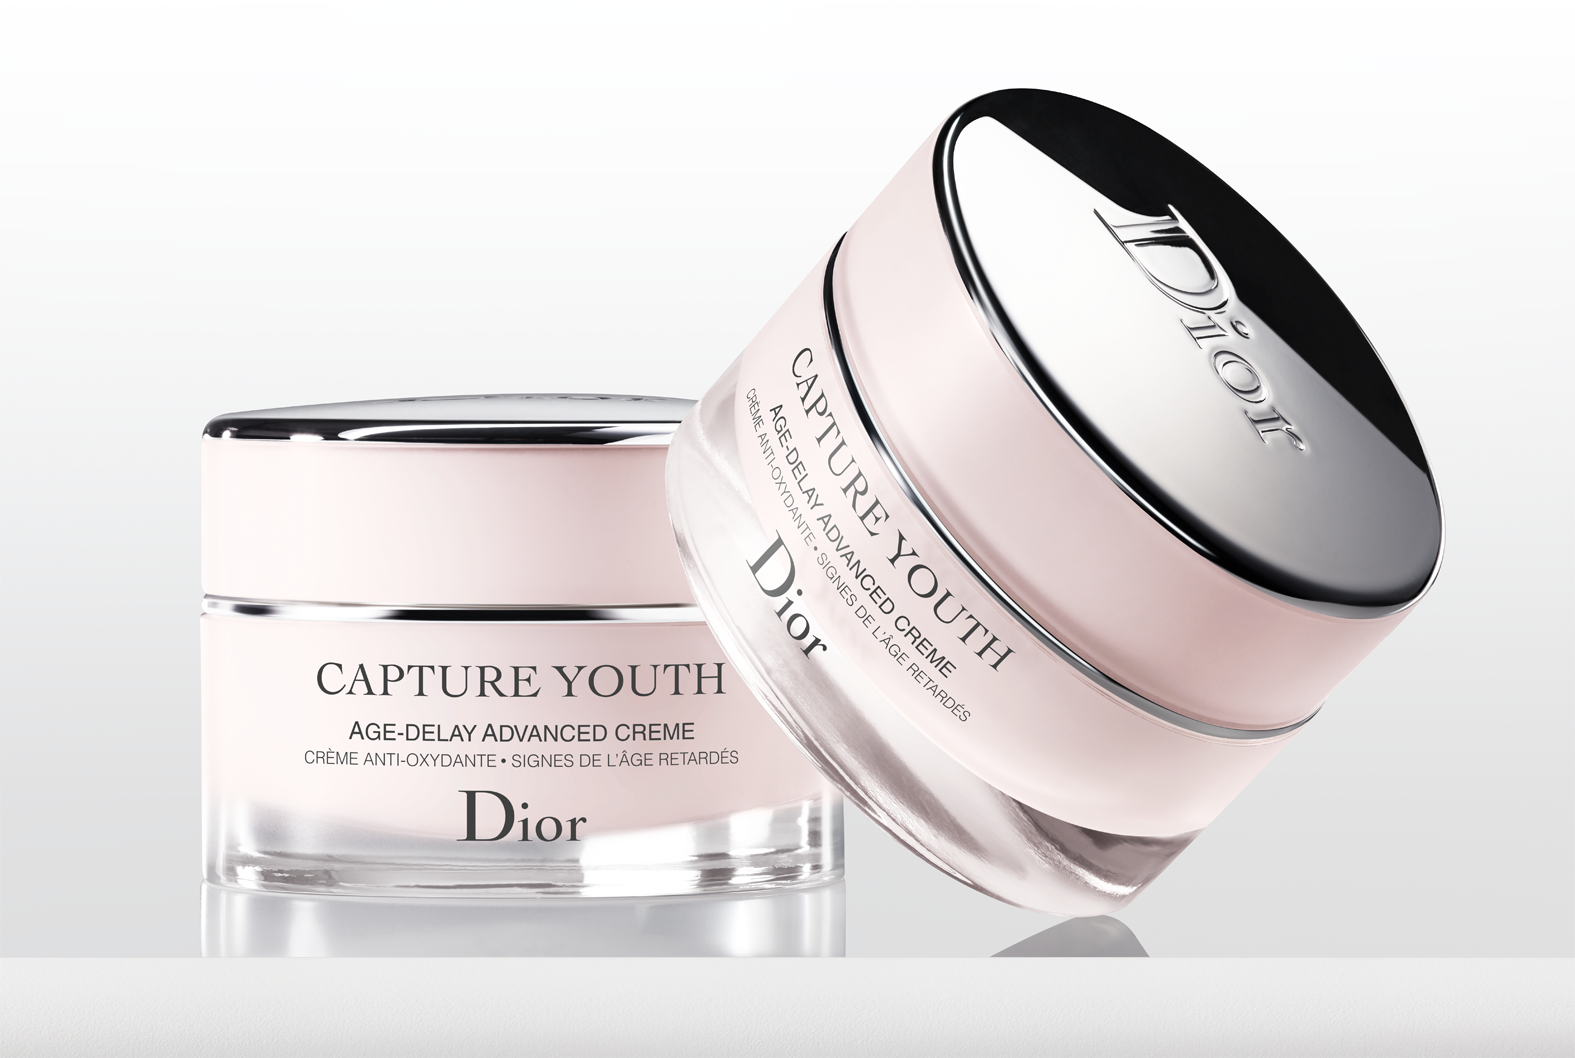 Dior Capture Youth - Cara Delevingne